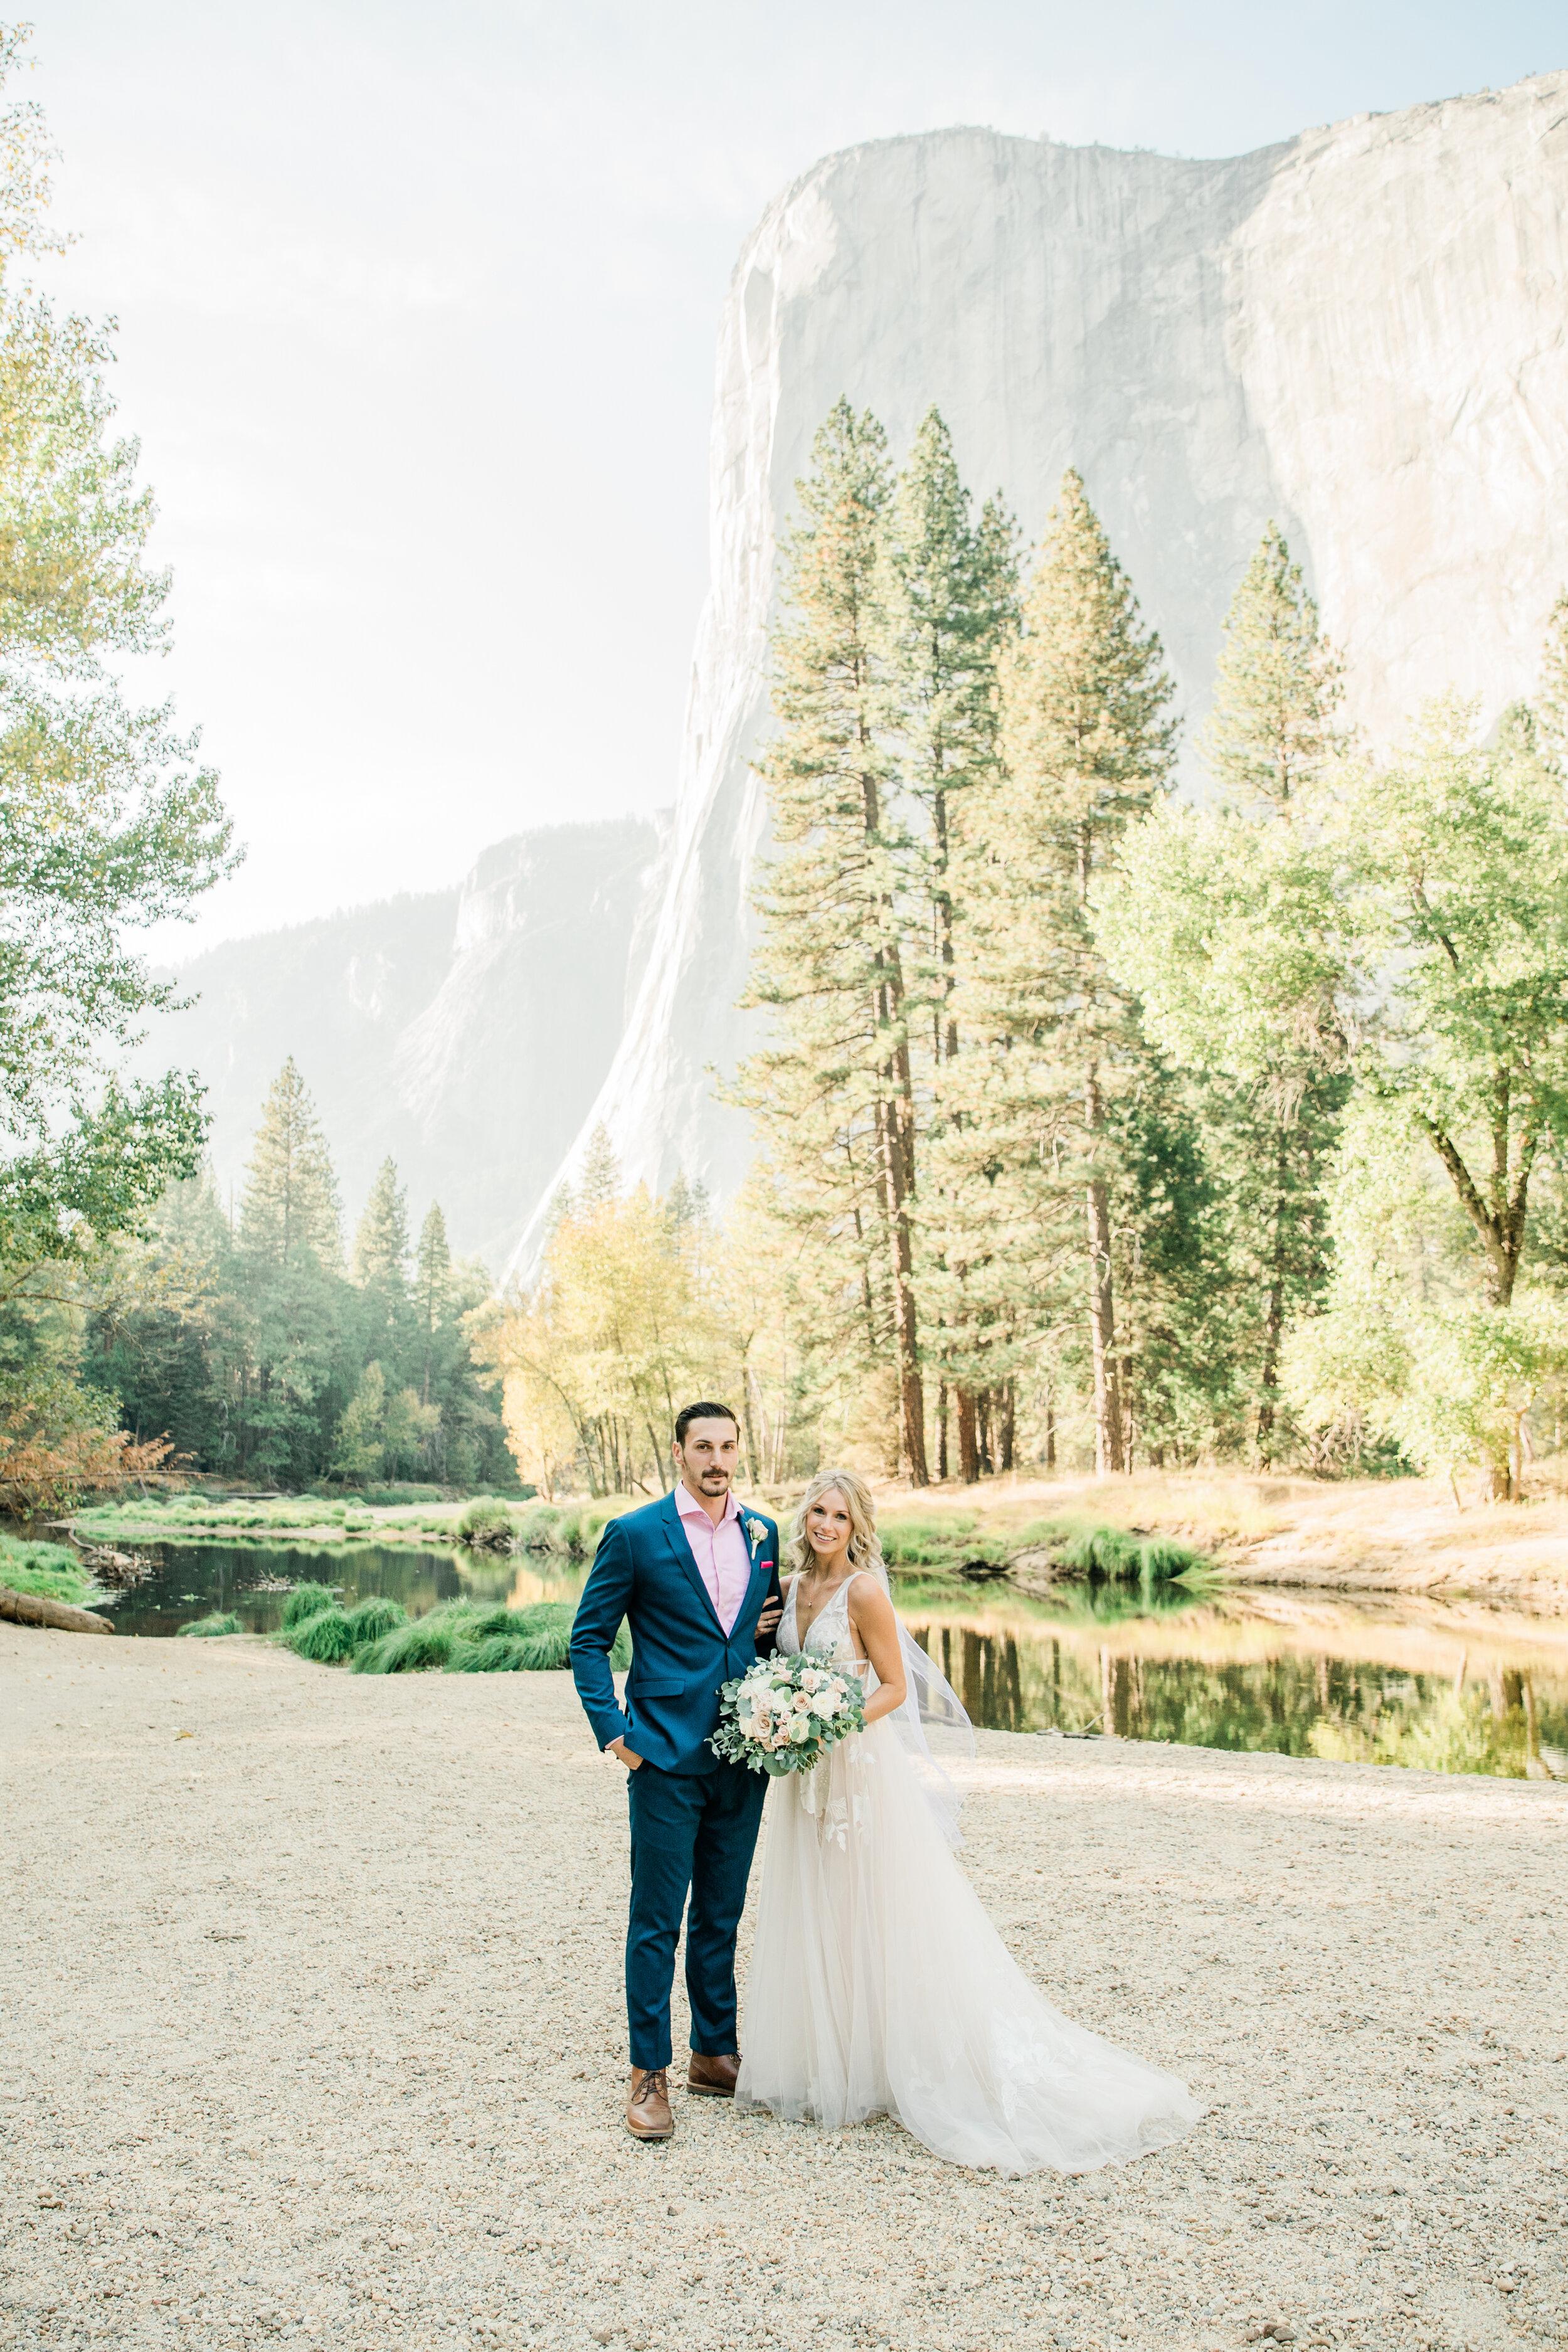 Leanne and Joe - Married - Sneak Peeks - Lauren Alisse Photography-25.jpg